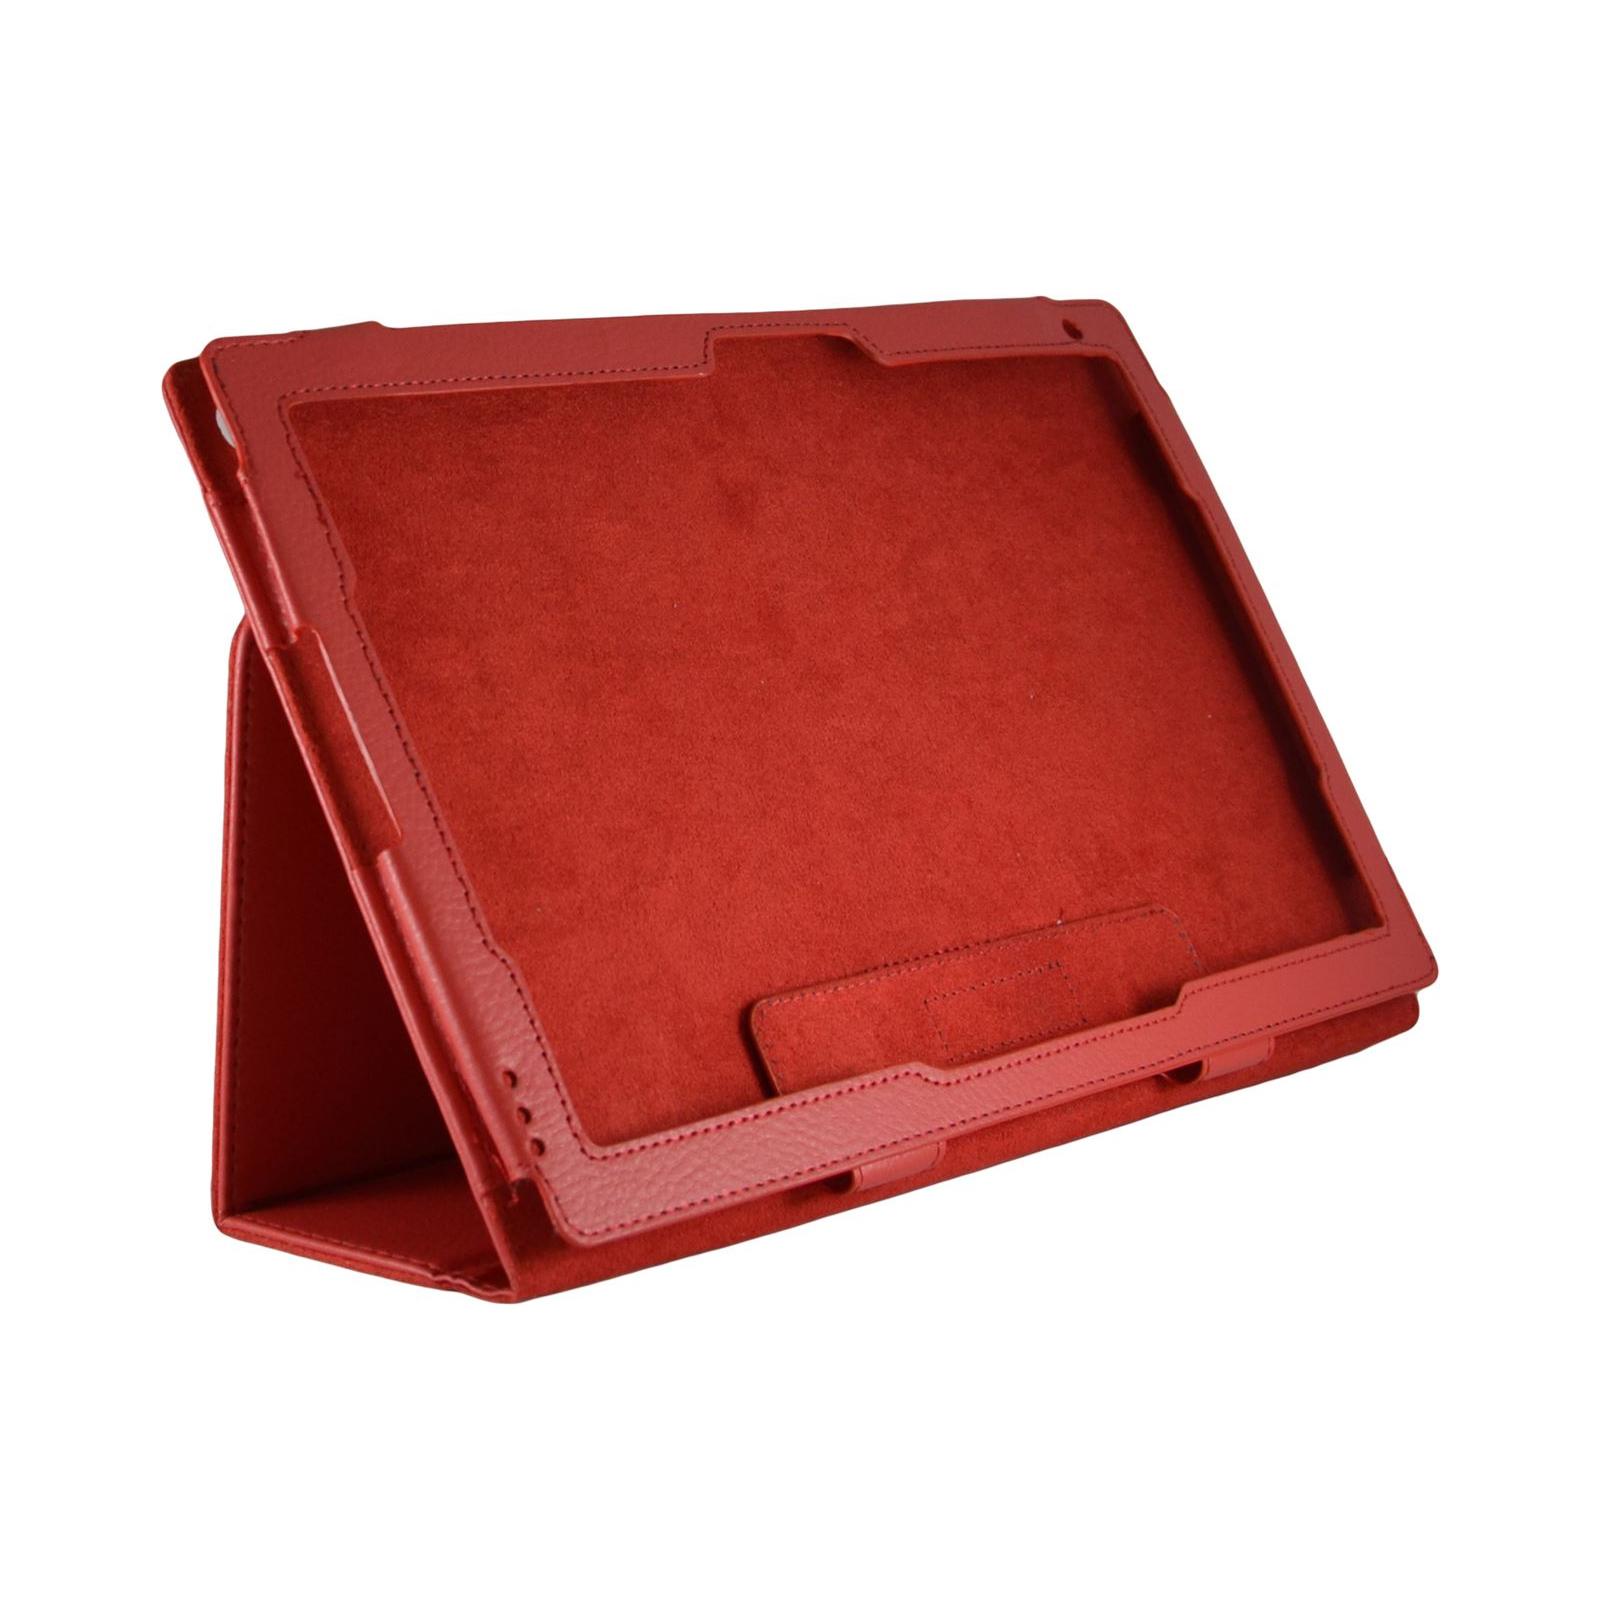 "Чехол для планшета Pro-case 10,1"" Pro-case Sony Tablet Z2 red (PC STZ2red) изображение 4"